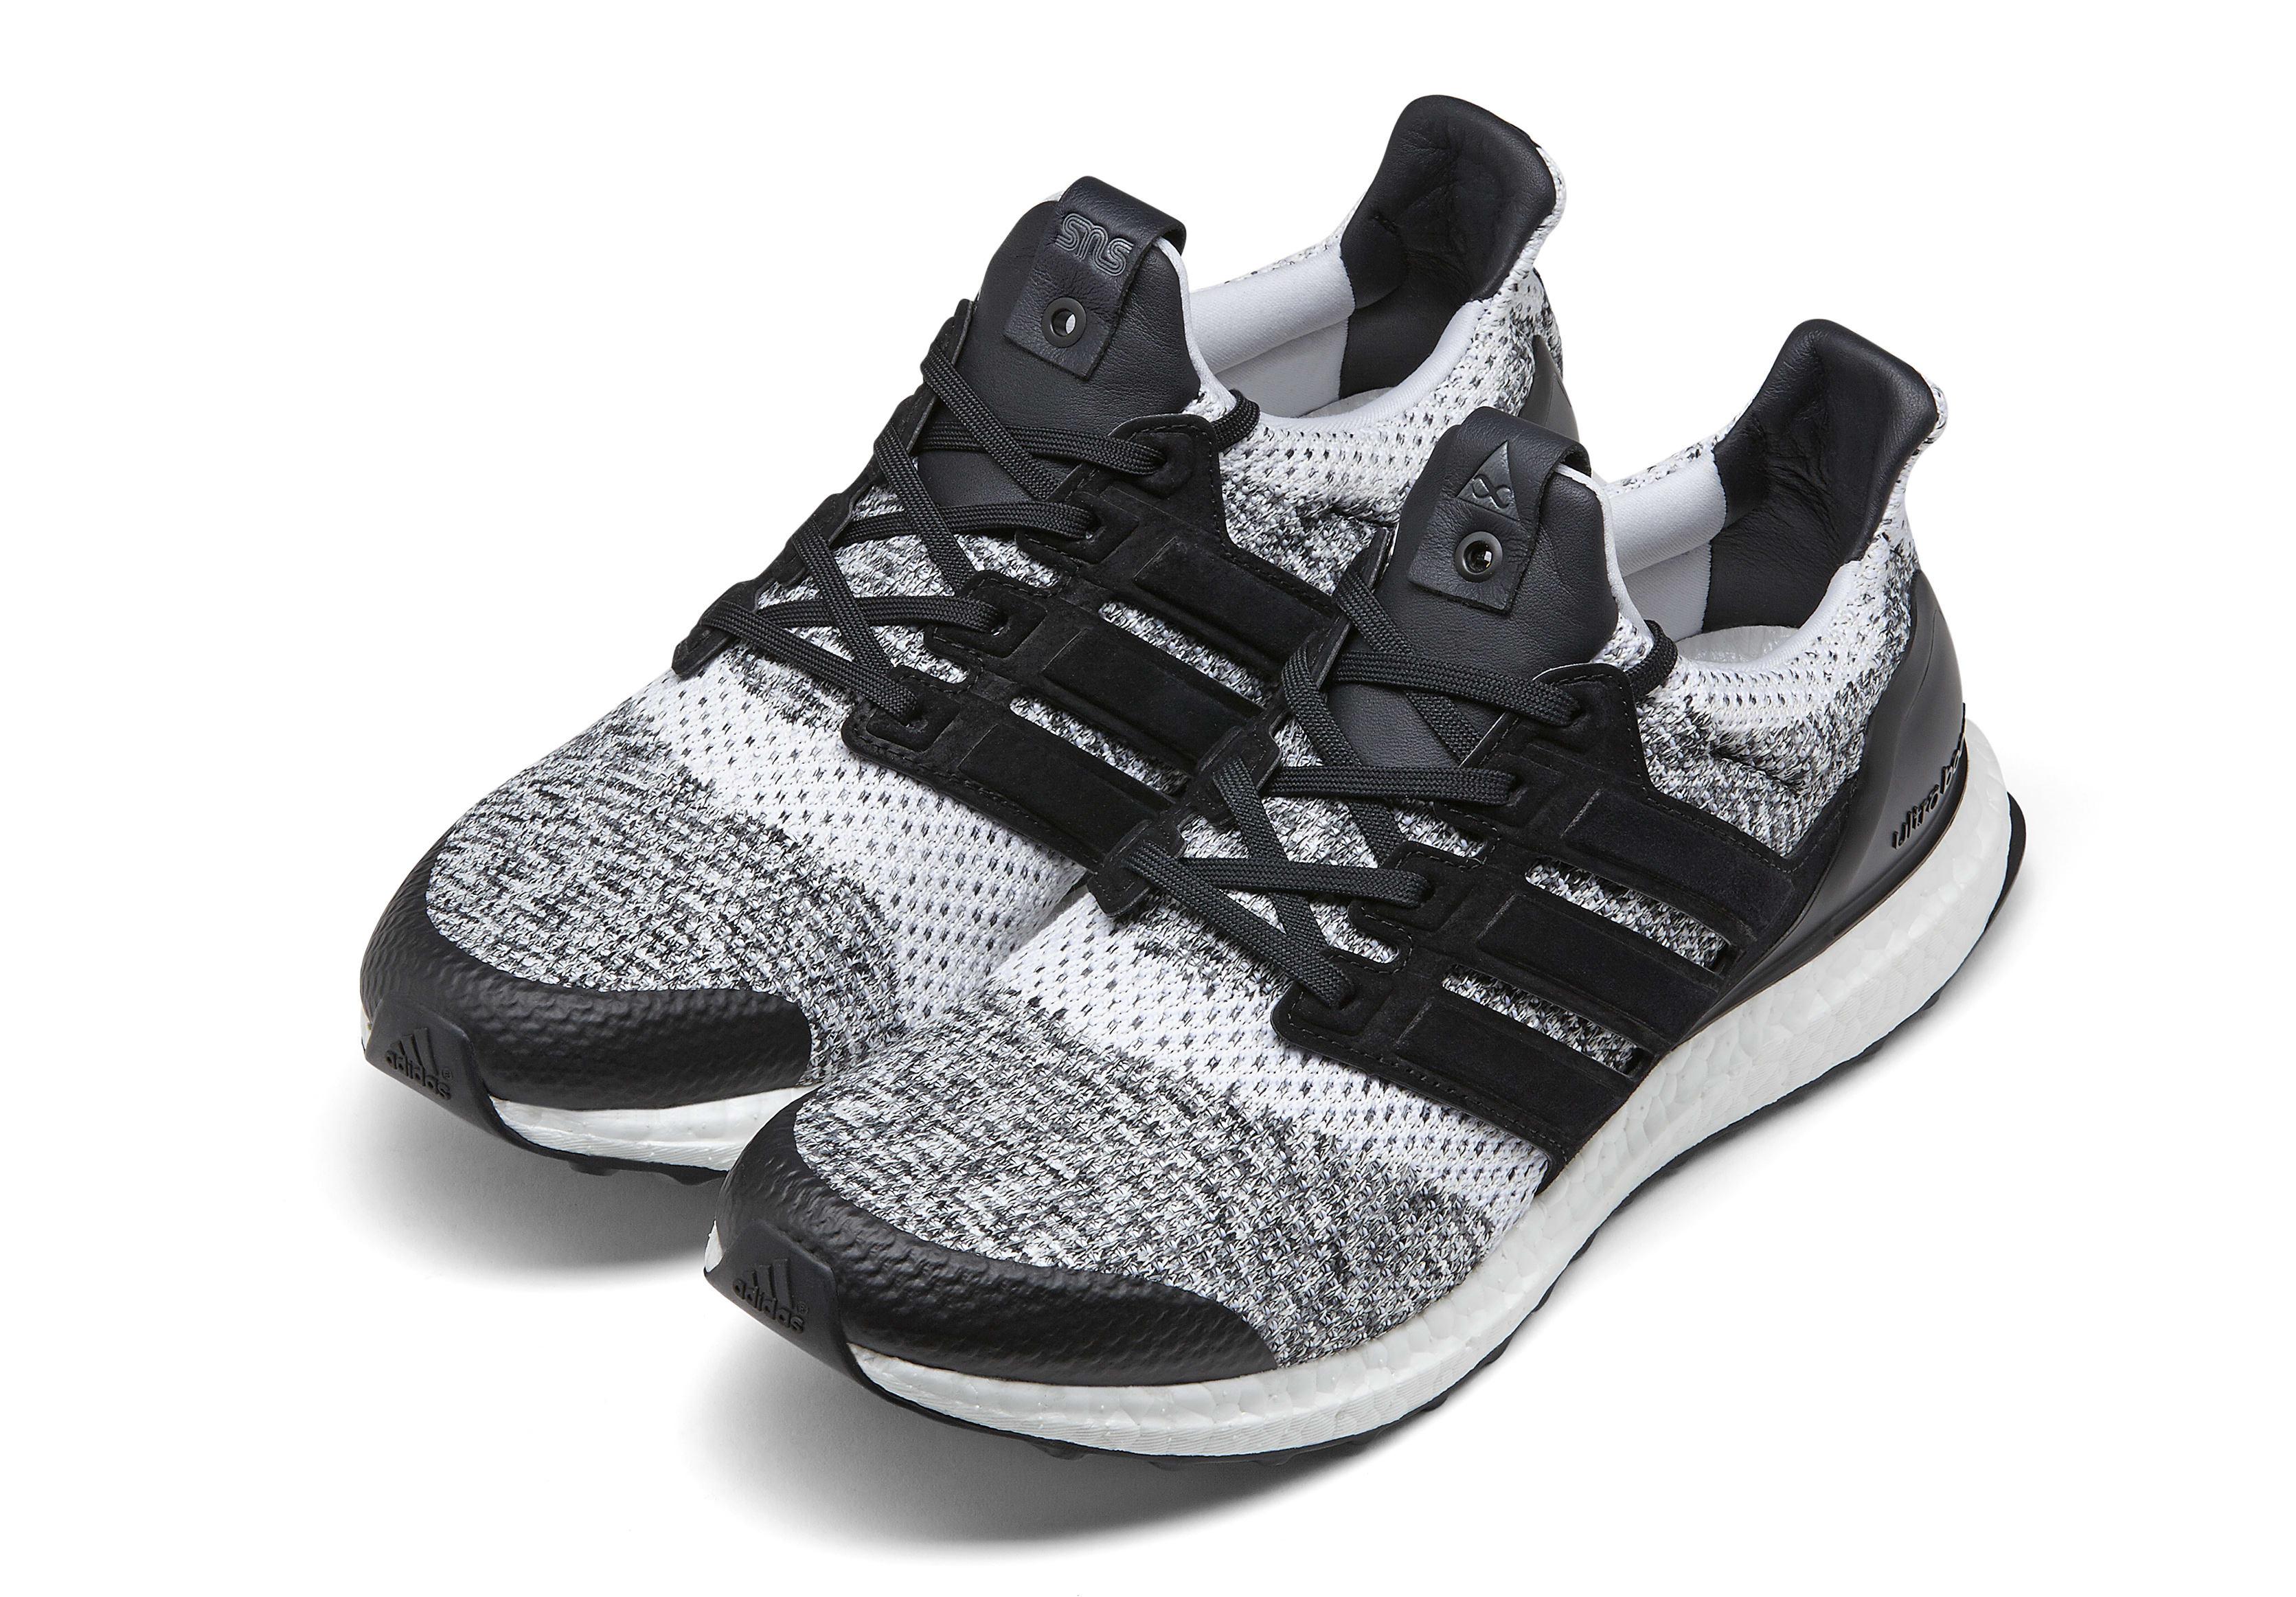 Sneakersnstuff Boost Ultra Superstar Sole Adidas Status Social SvIxnHS